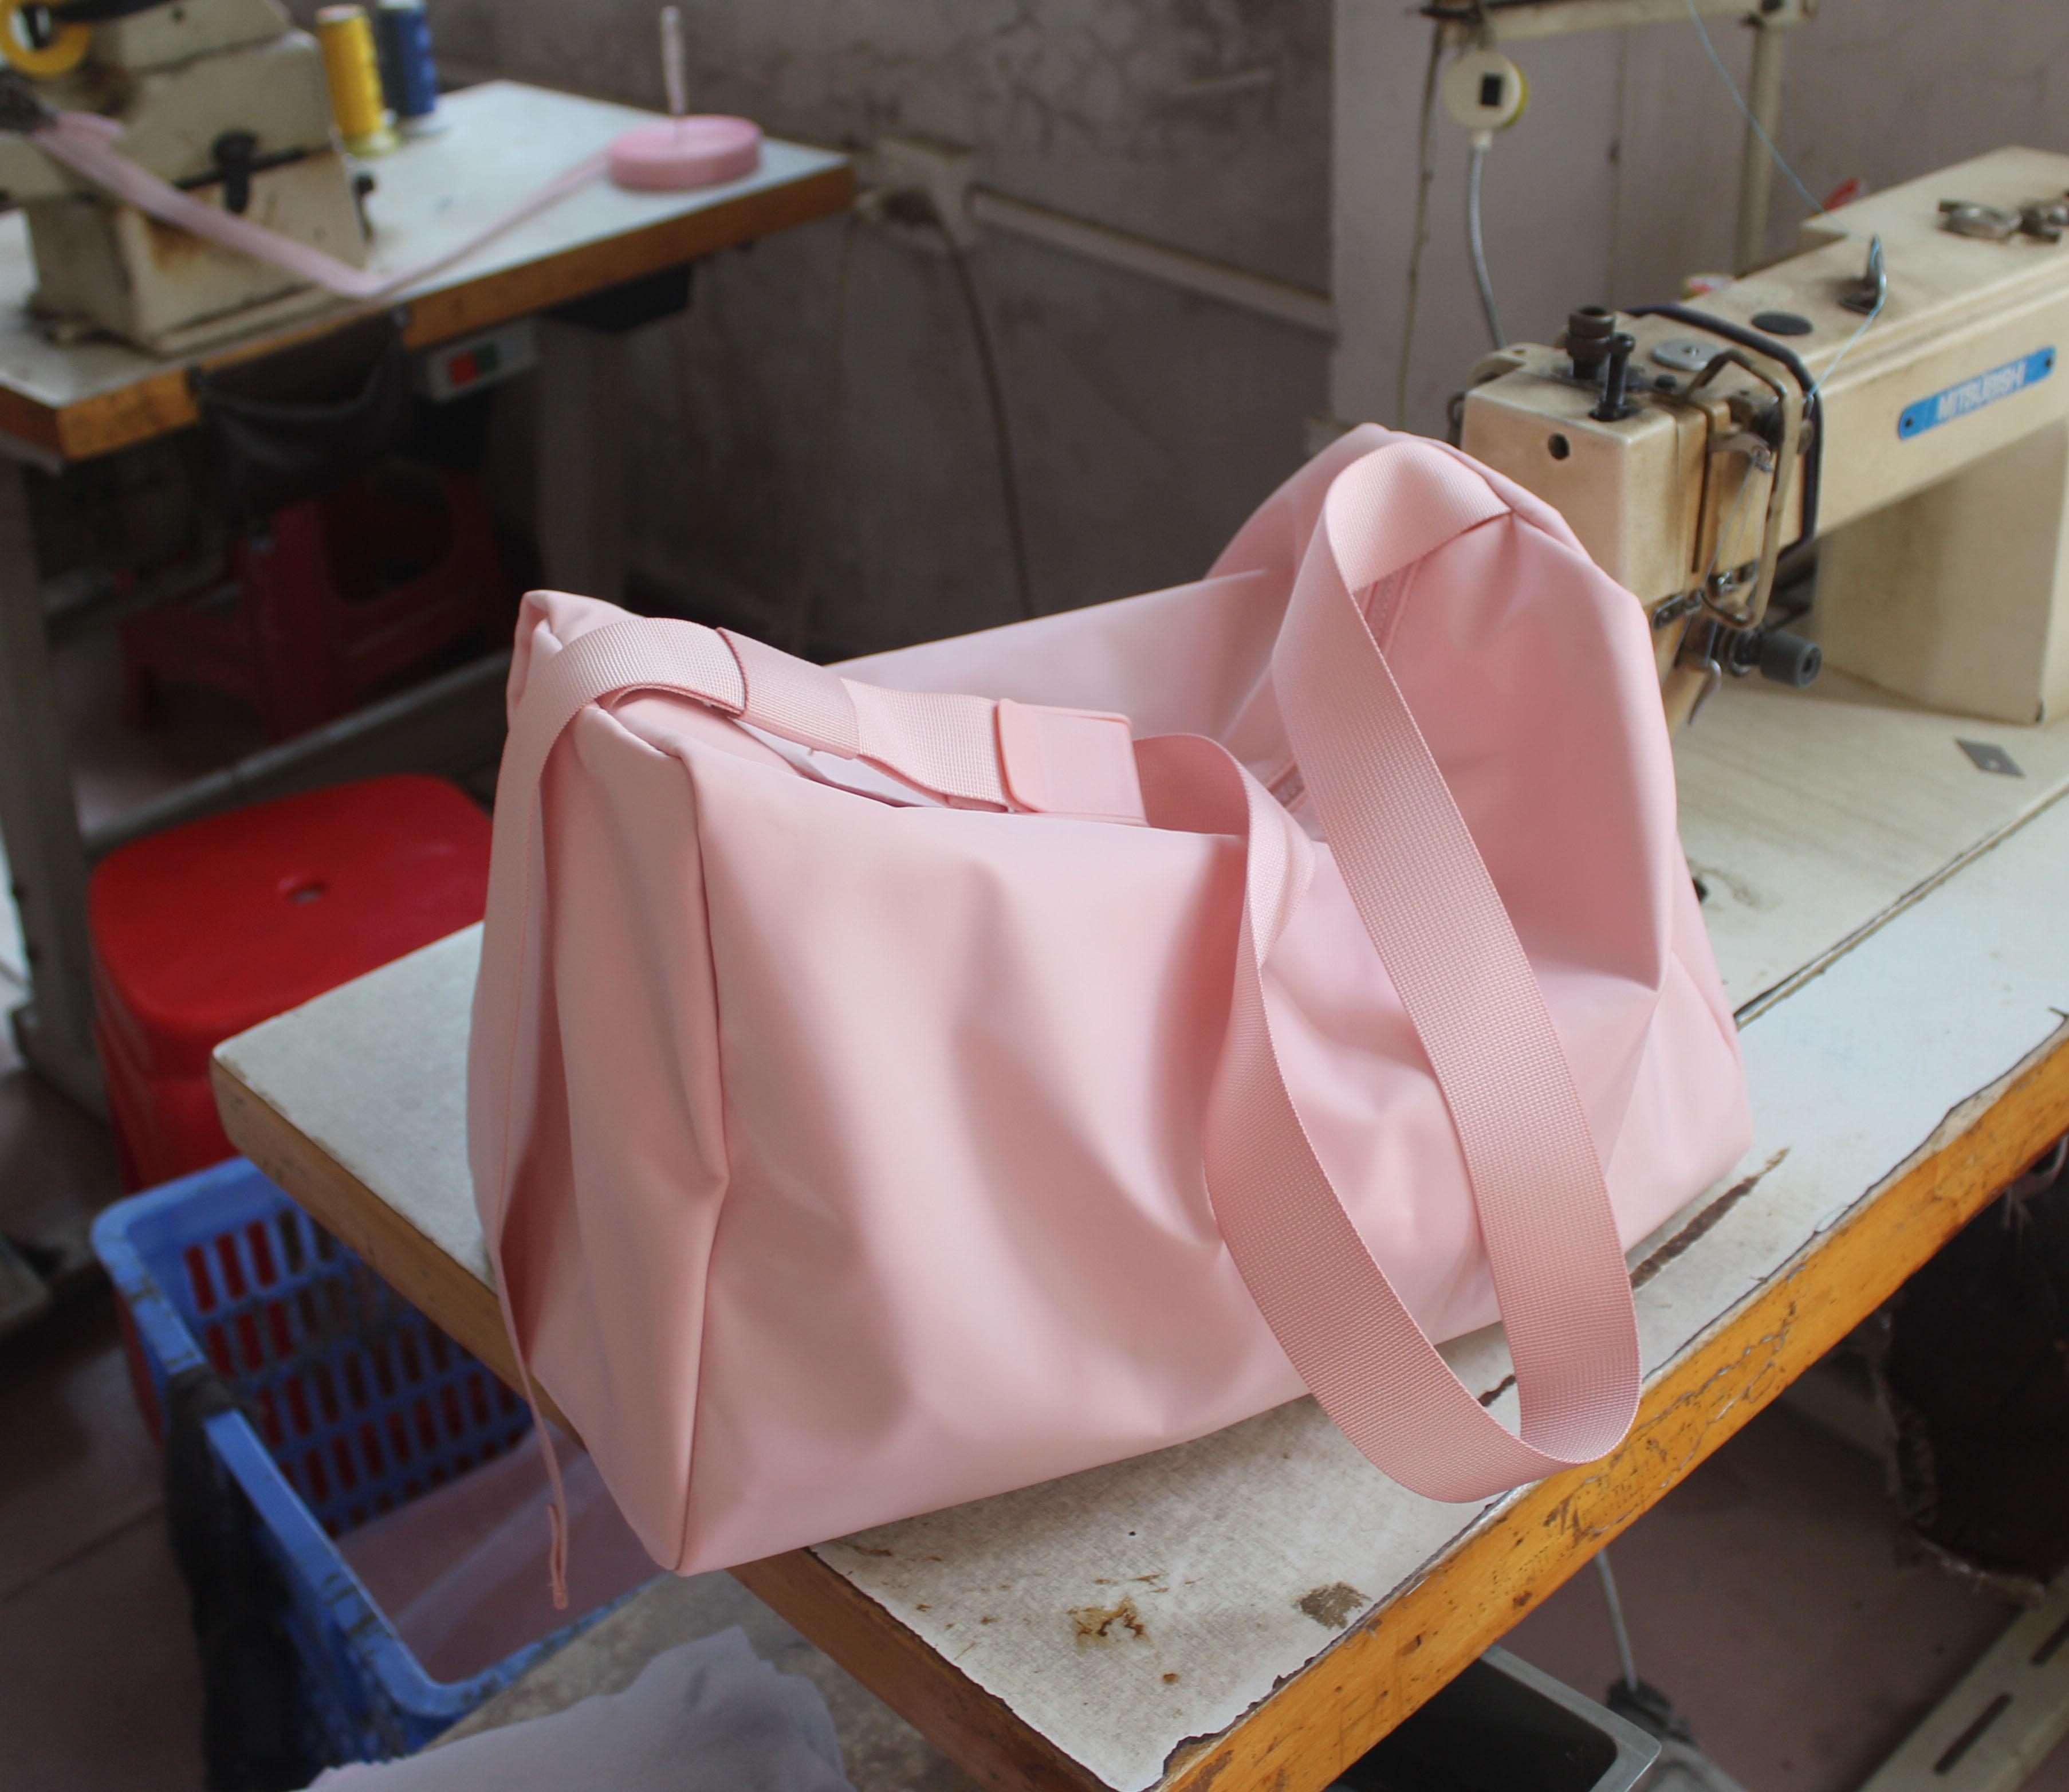 France COS New Style Womens Bag Canvas Large Bag Light Oxford Cloth Crossbody Bag Large Capacity Travel Shopping Bag